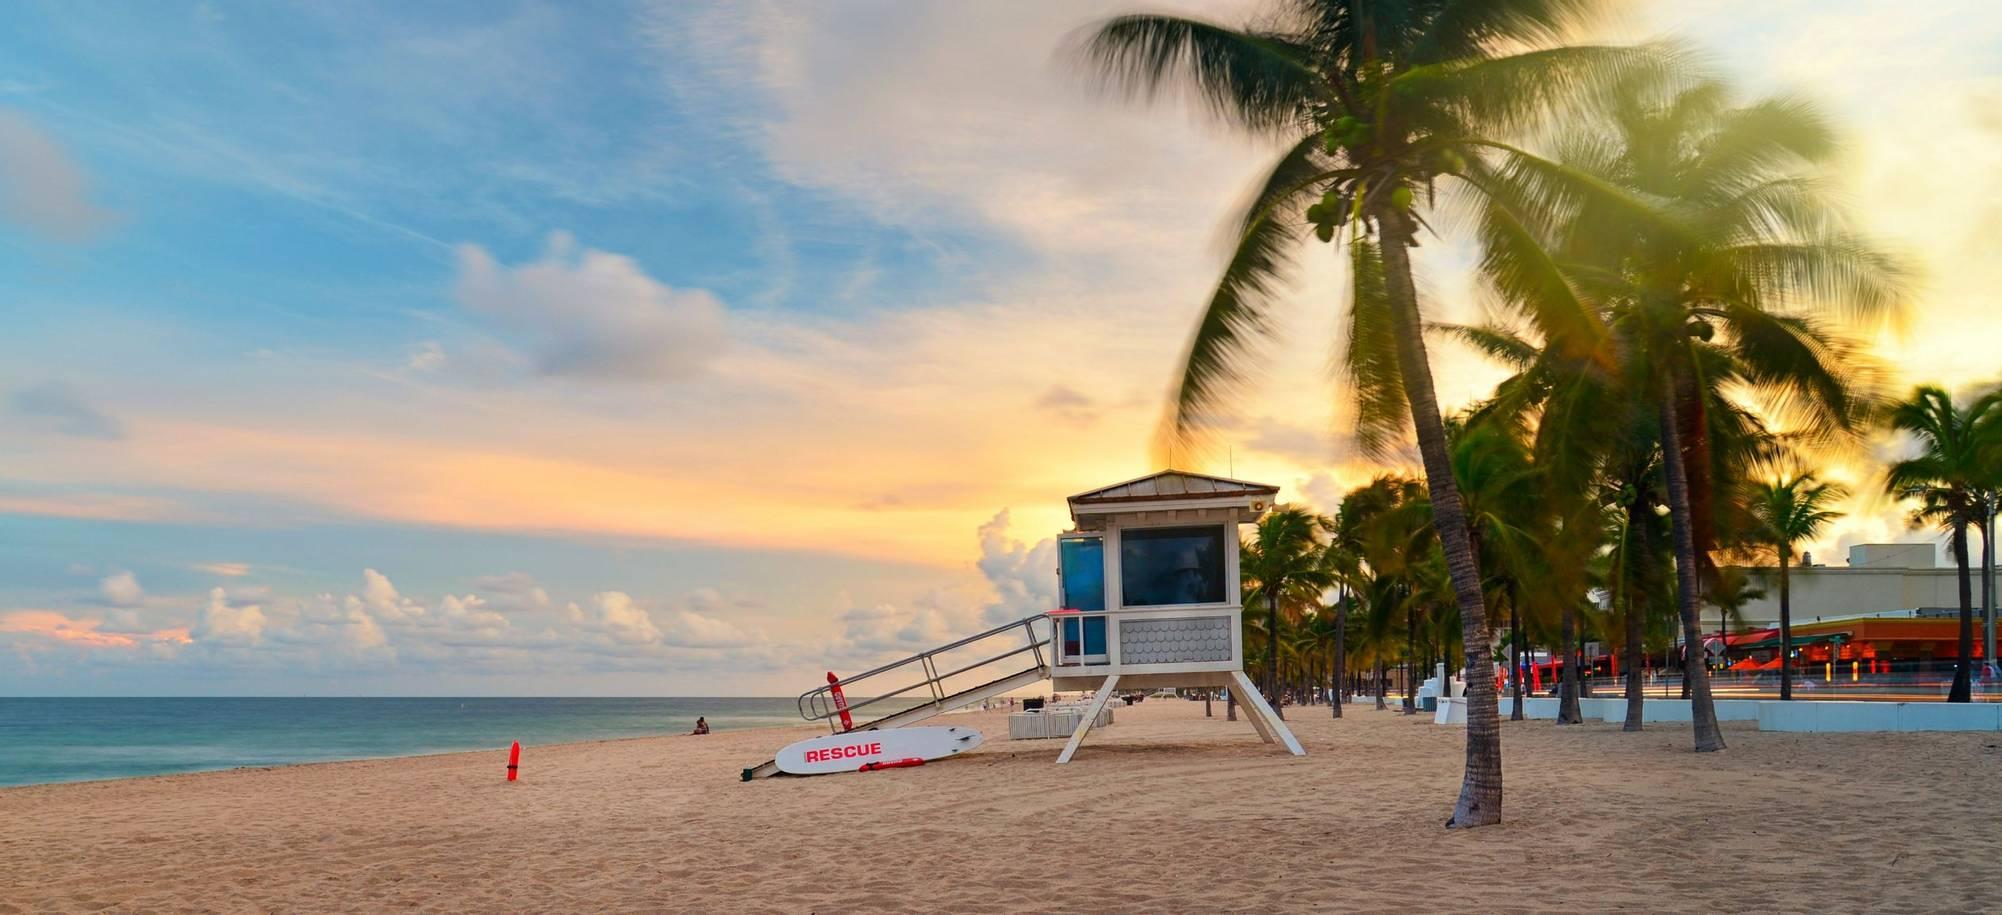 Itinerary Desktop - Day 1 - Fort Lauderdale.jpg